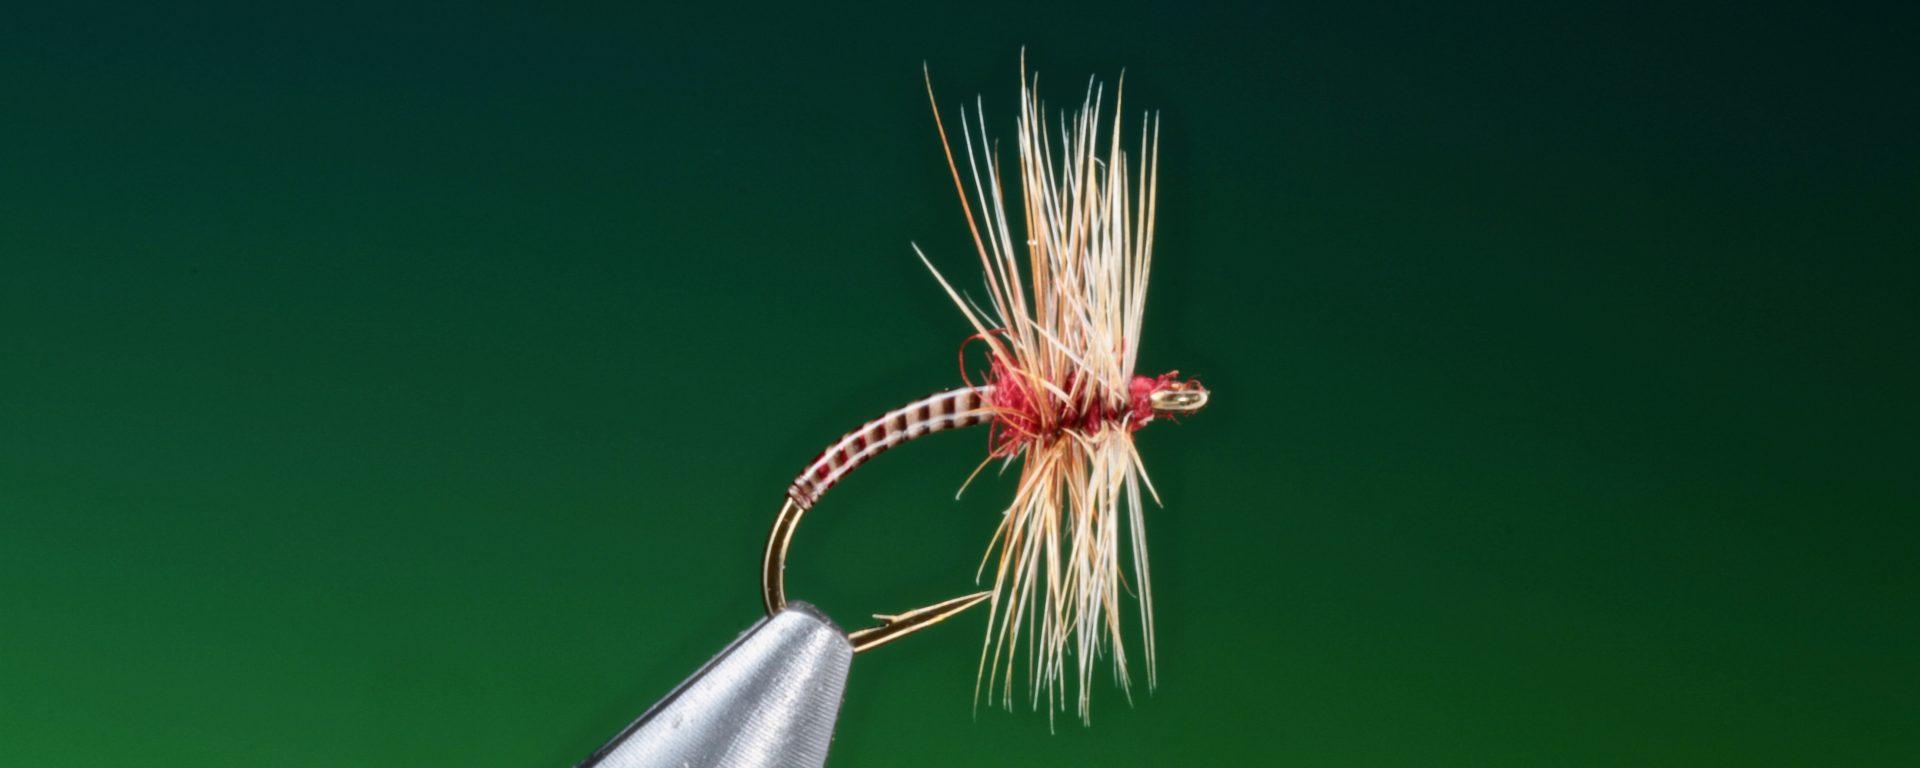 fly tying pay day midge